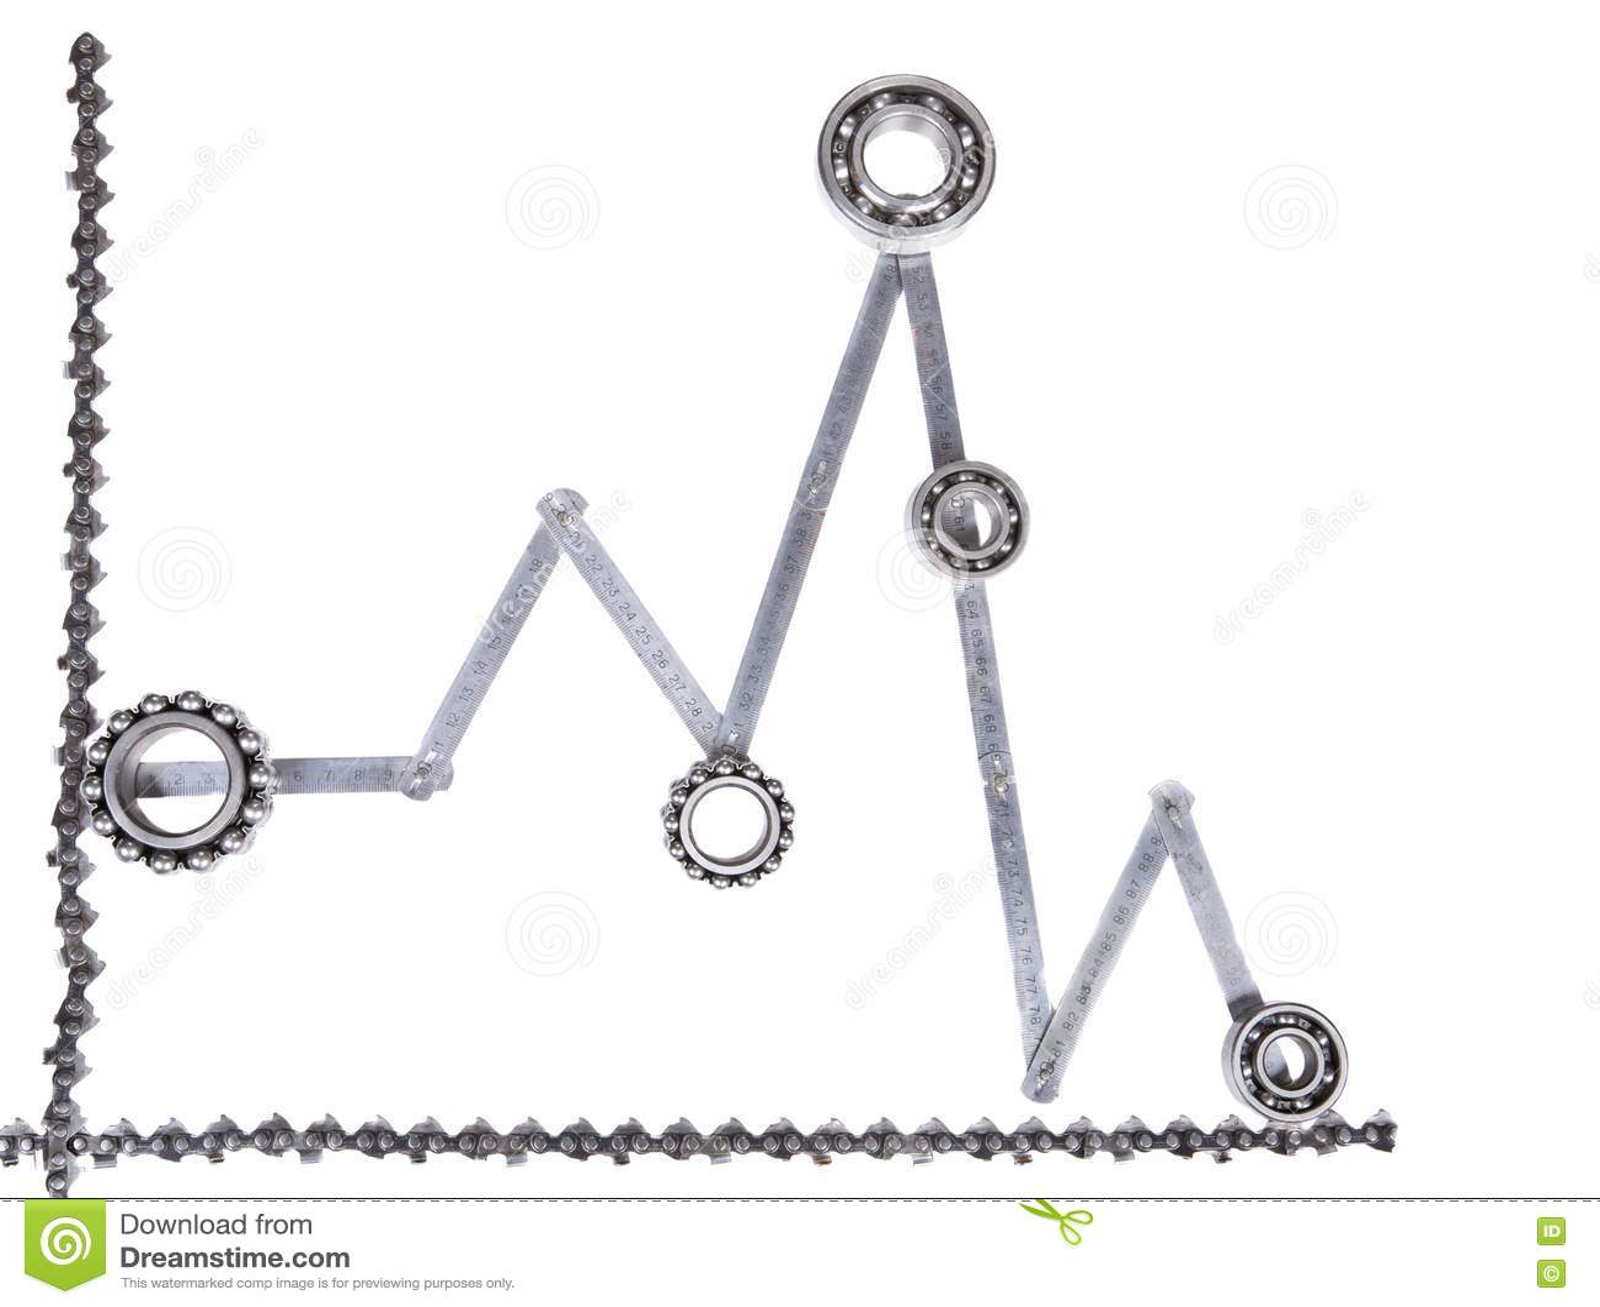 Ball Bearing And Diagram Stock Photo